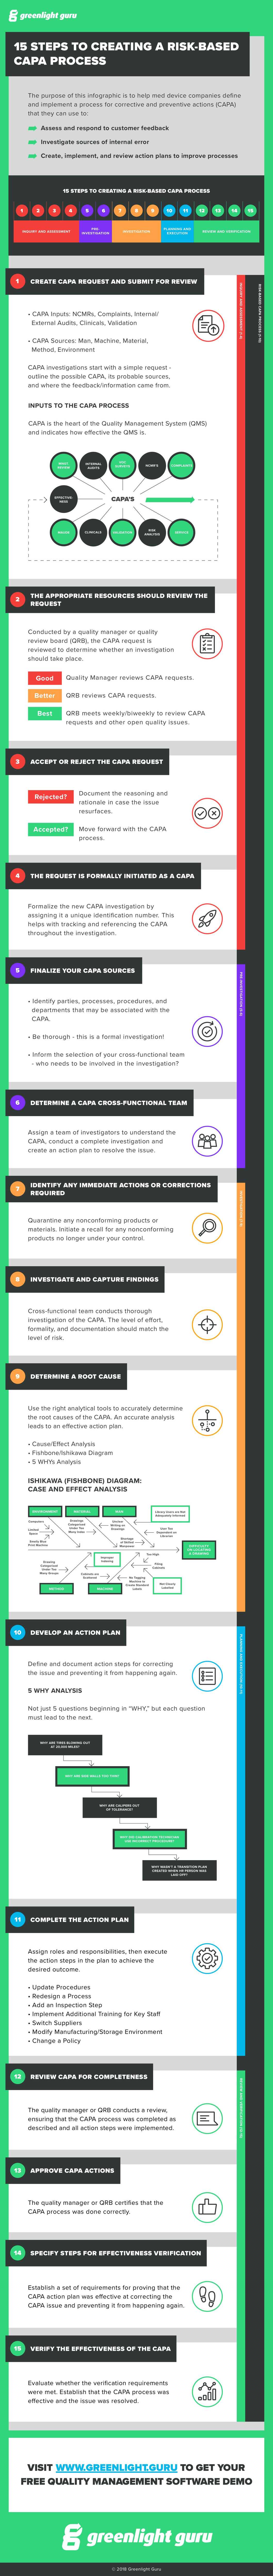 GG_CAPA_Infographic_180220